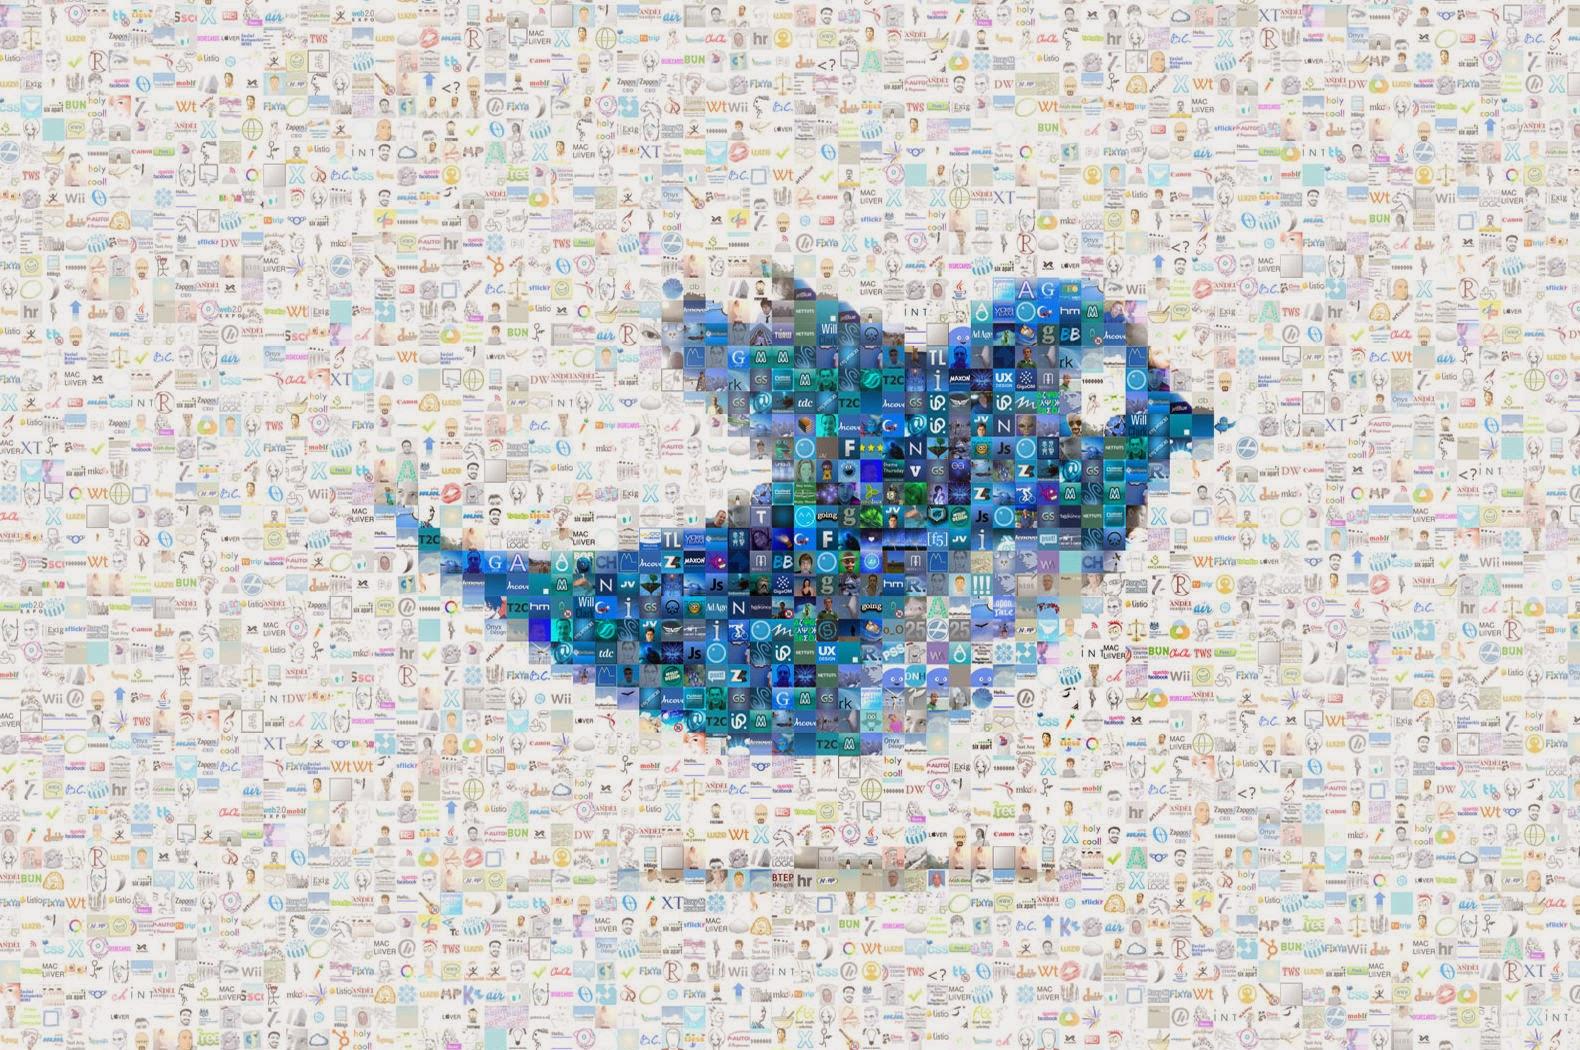 Porqué-no-ignorar-twitter-censura-mundo